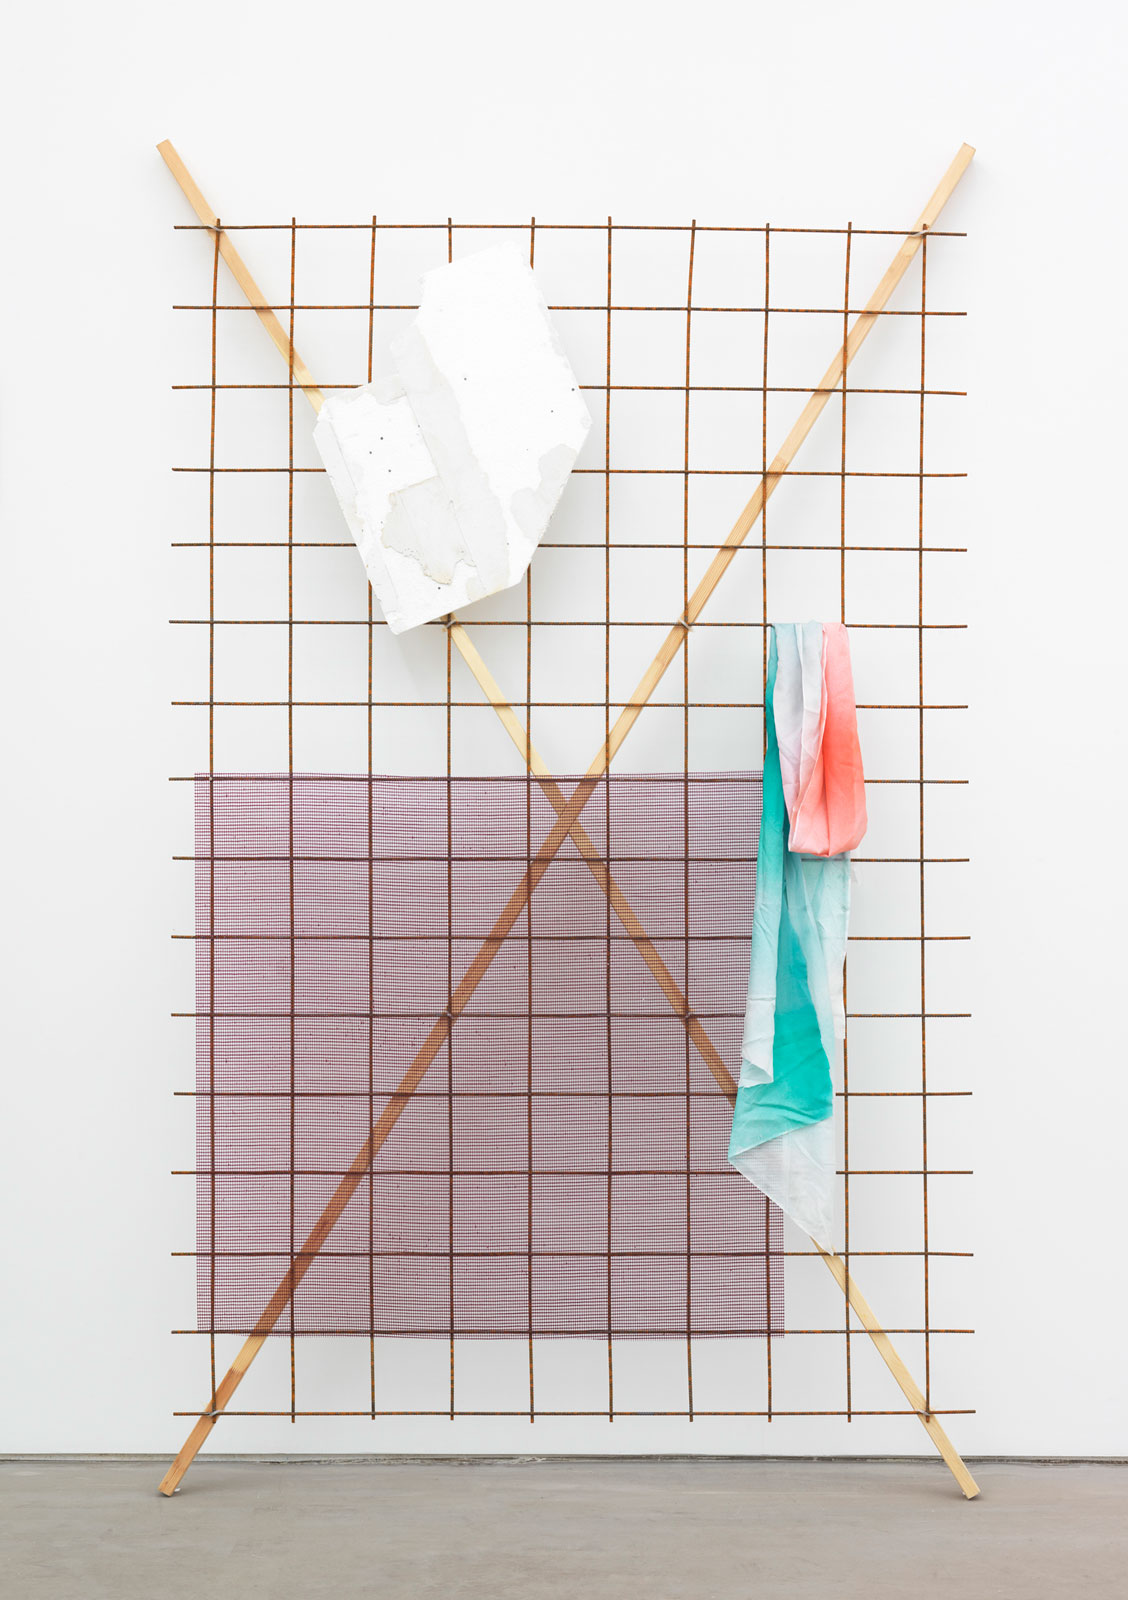 Grid (Fade), 2014<br/>reinforcement mesh, wood, mixed media<br/>260 x 155 x 30 cm